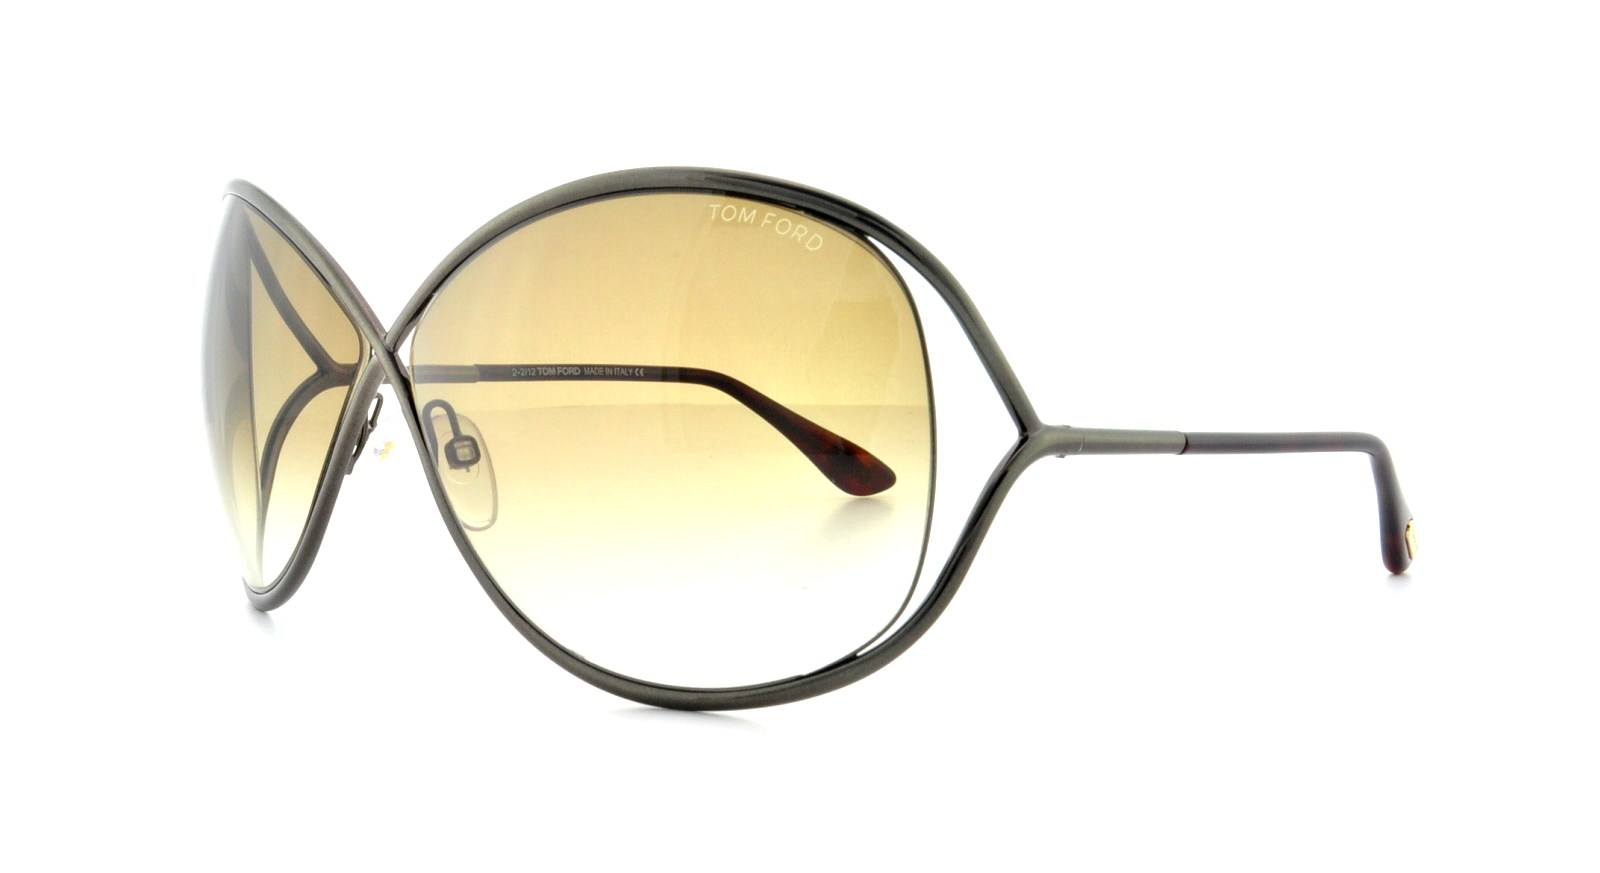 9e93463d66b Details about TOM FORD Sunglasses FT0130 MIRANDA 36F Shiny Dark Bronze 68MM